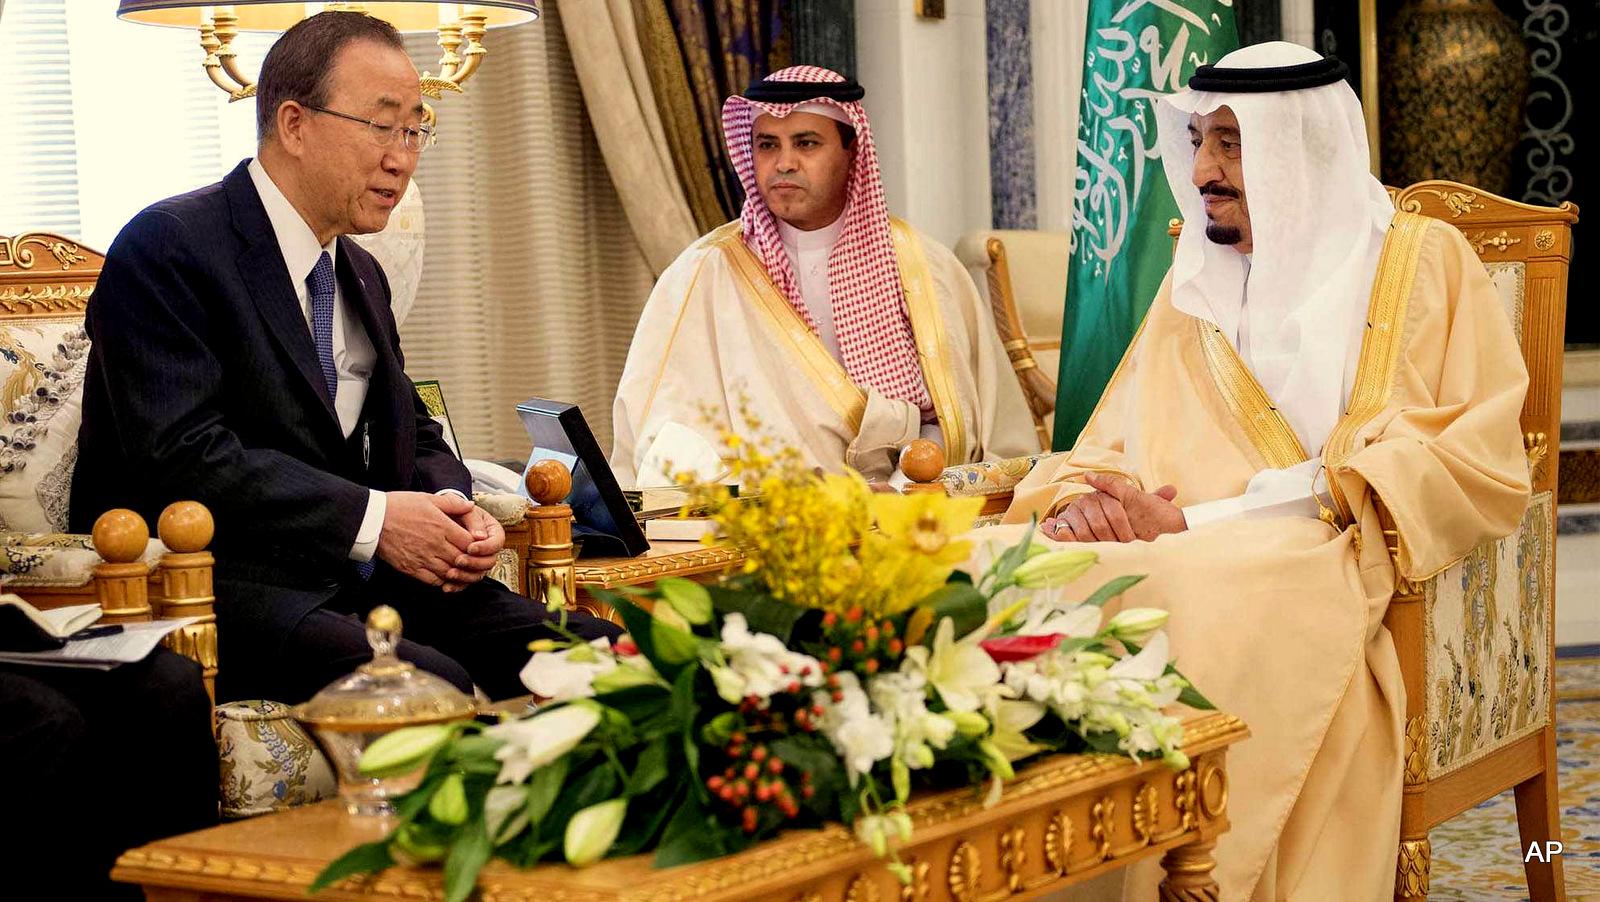 United Nations Secretary General Ban Ki-Moon, left, meets with King Salman bin Abdul-Aziz Al Saud, right